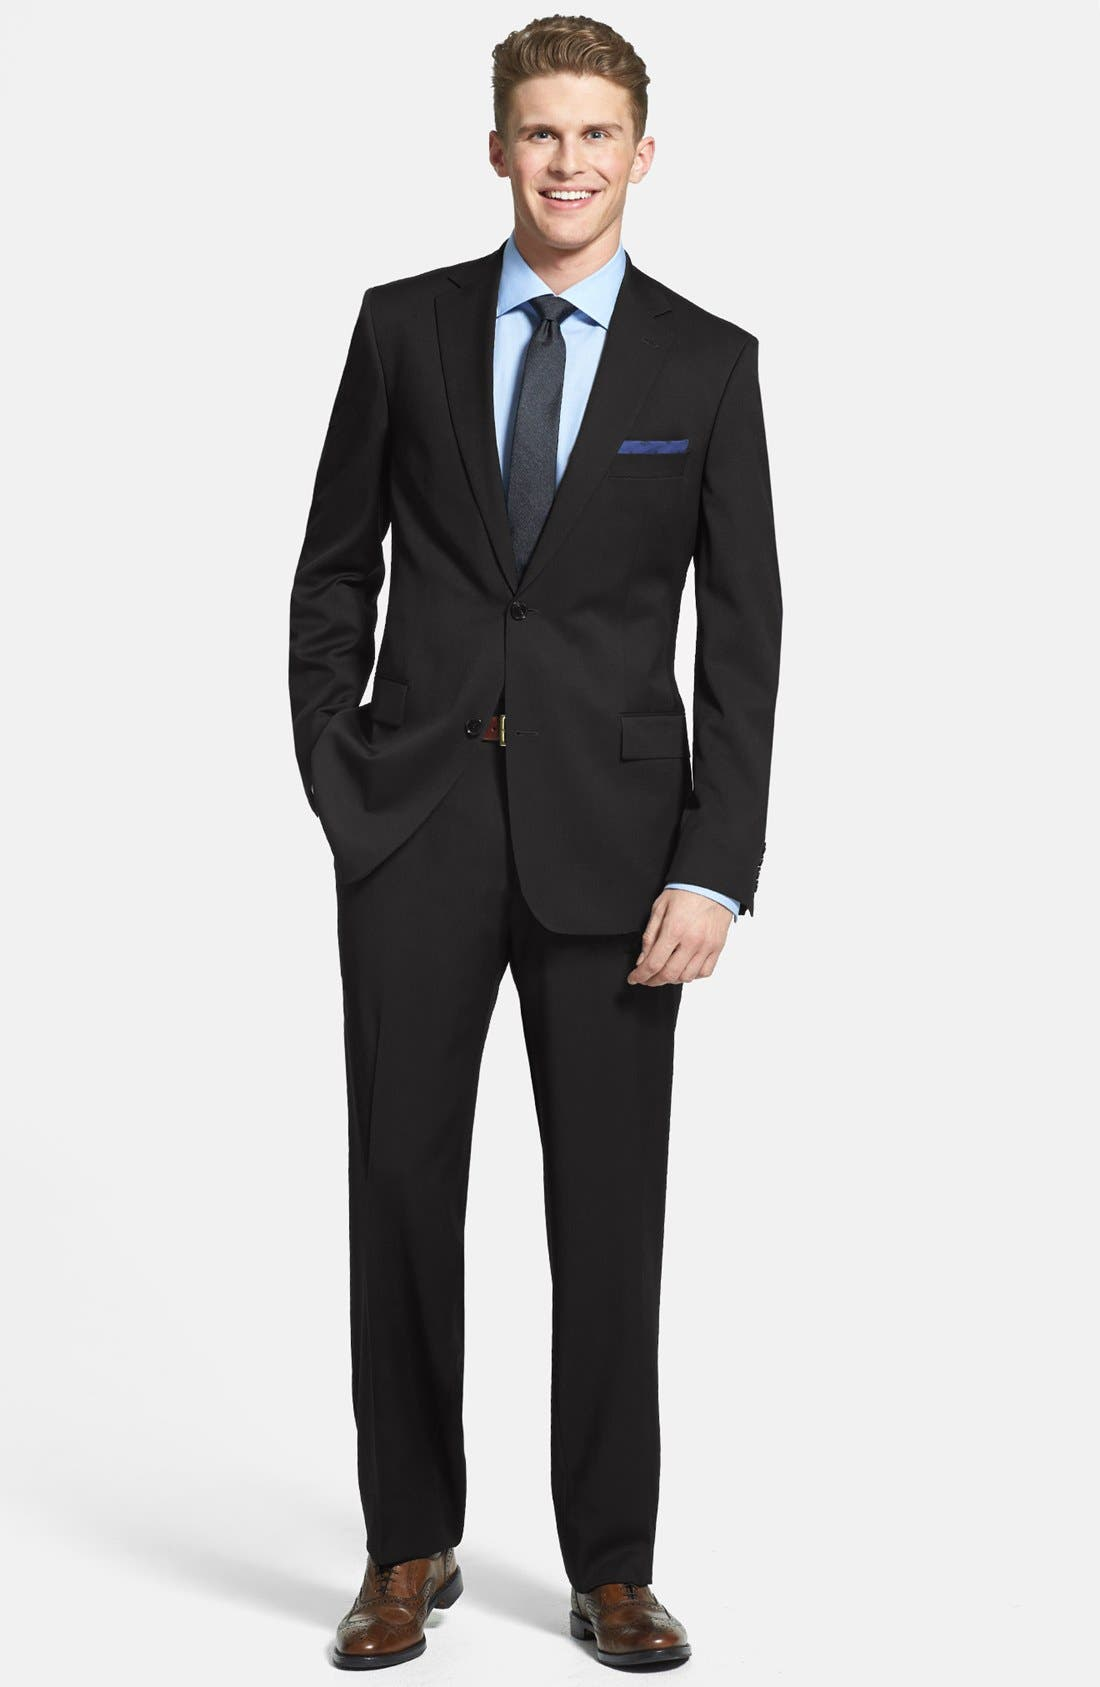 Main Image - BOSS HUGO BOSS 'Pasolini/Movie' Wool Suit